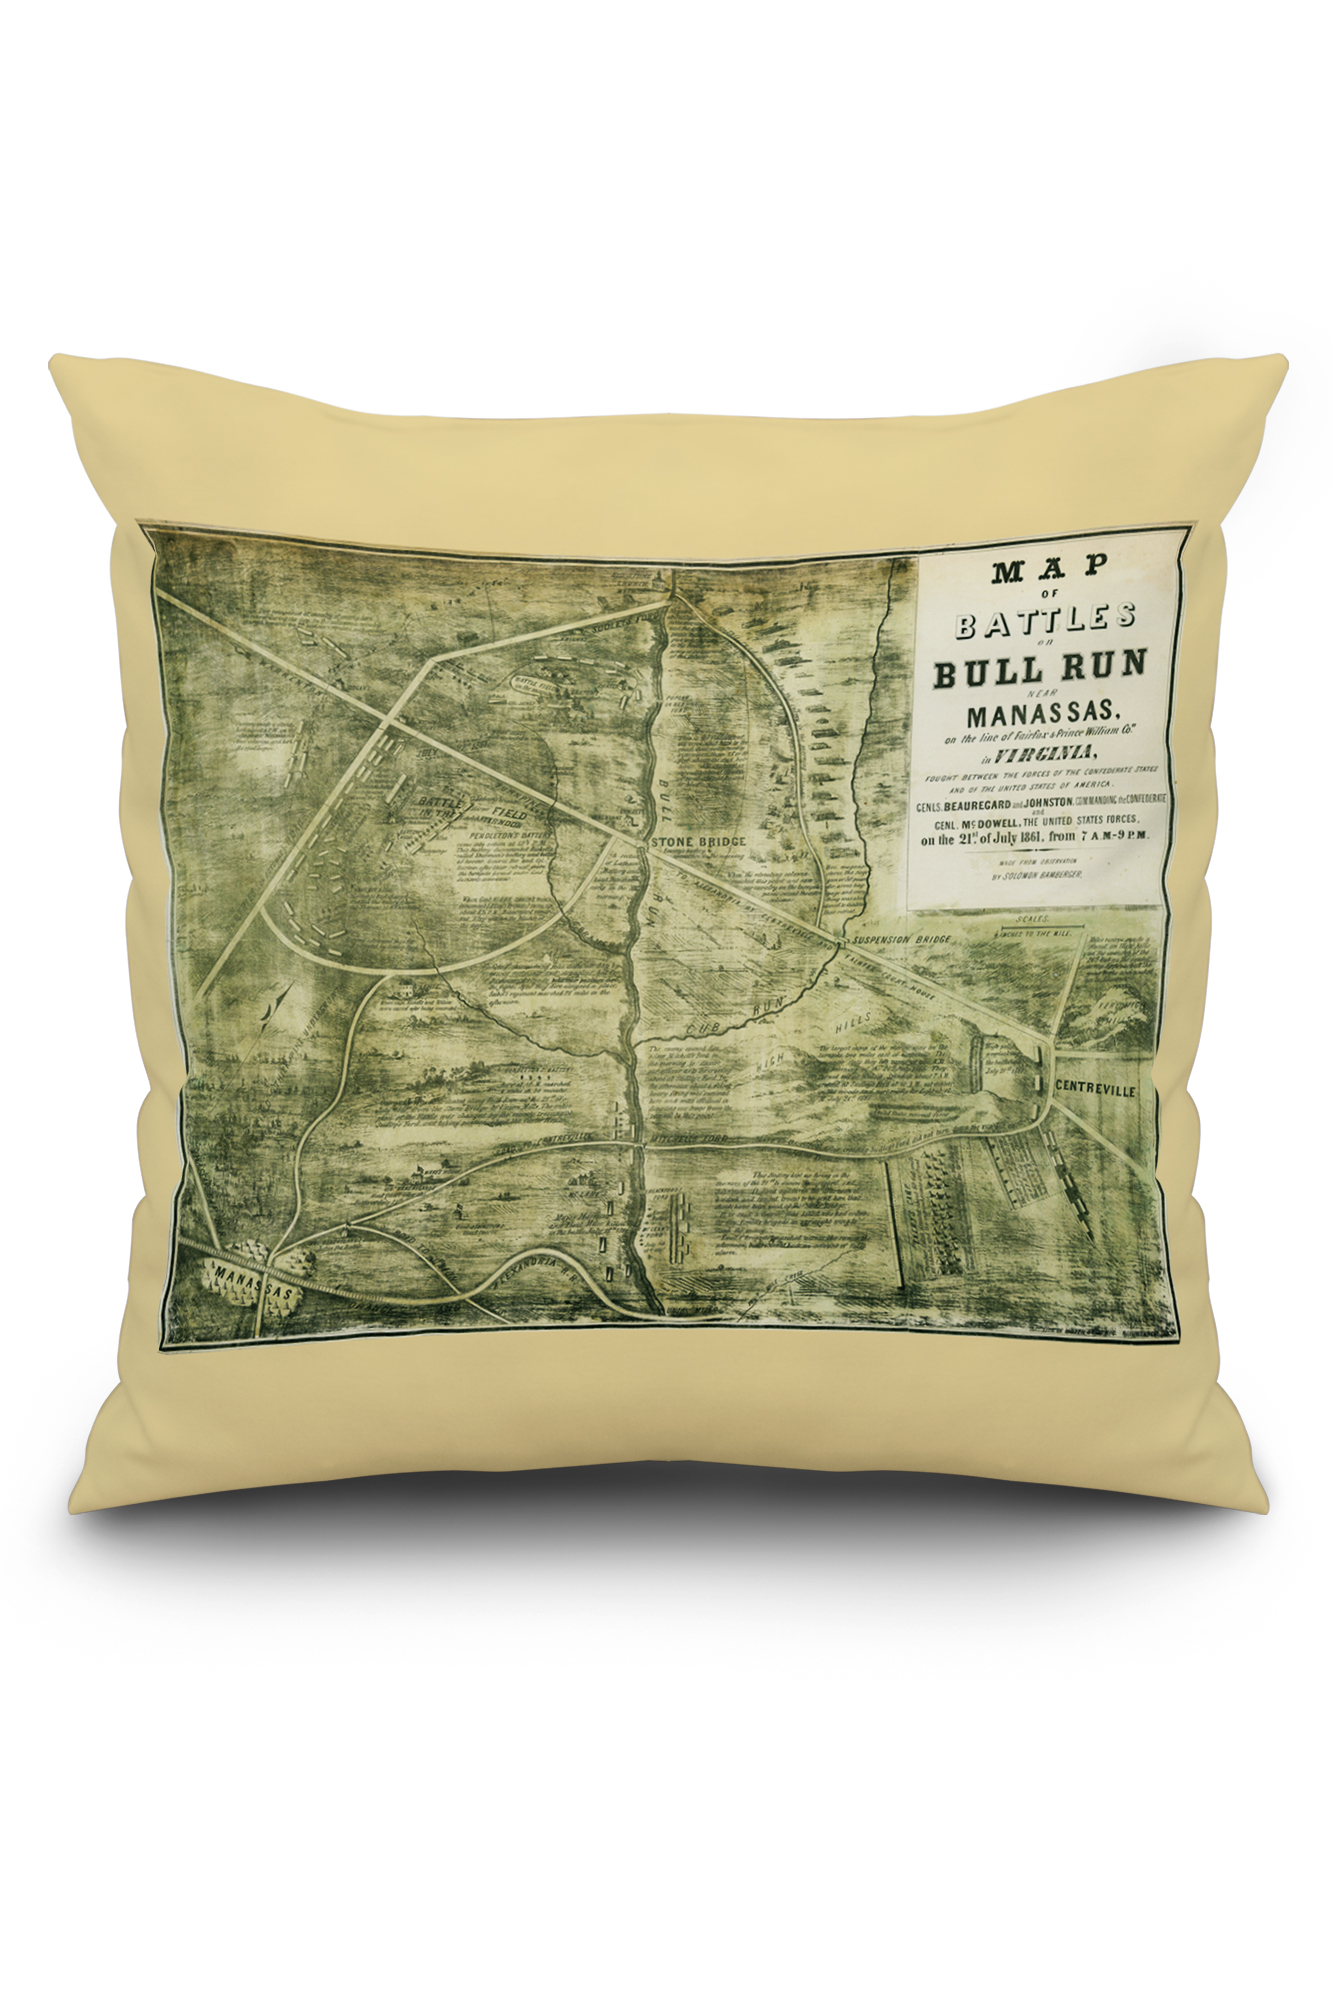 First Battle of Bull Run - Civil War Panoramic Map (16x16 Spun Polyester on